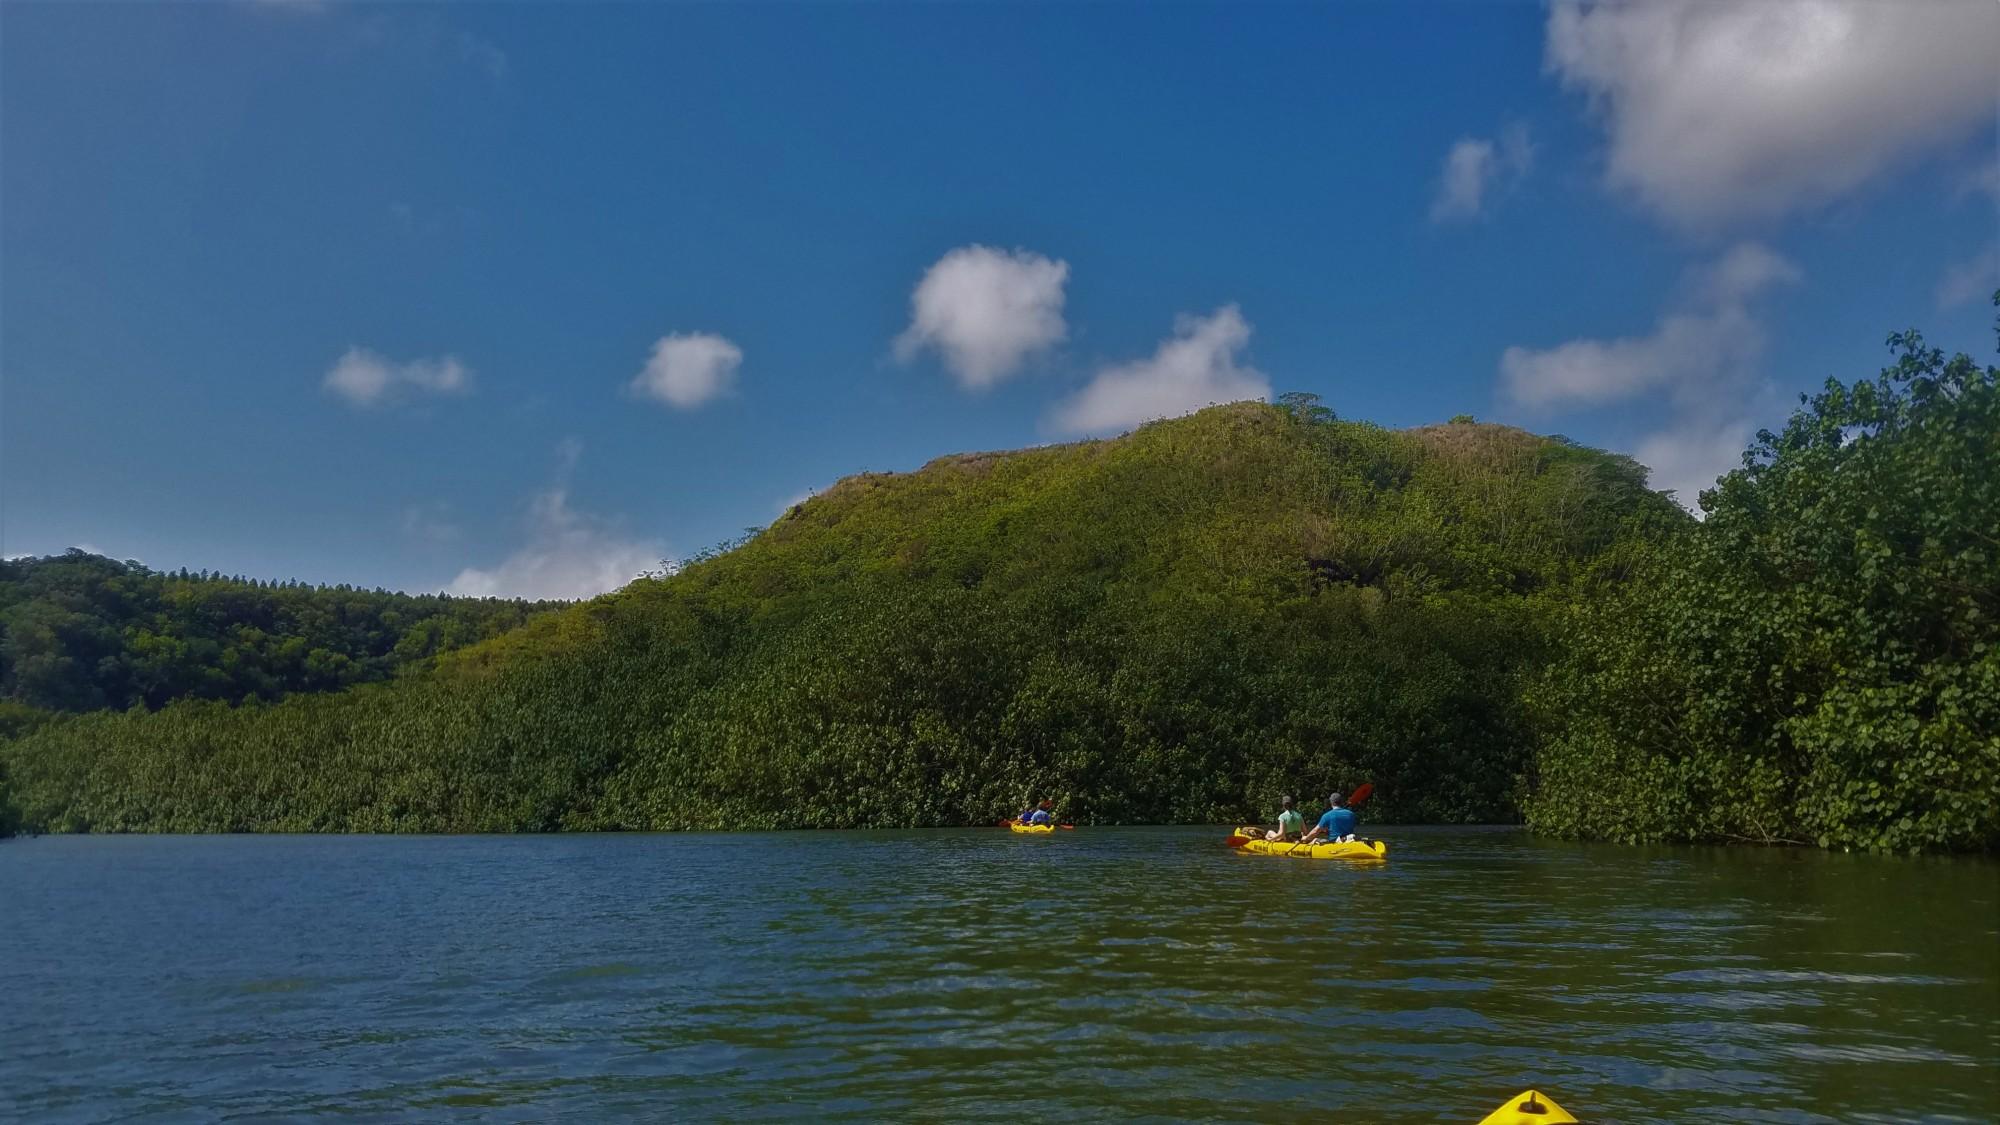 Kauai, Hawaii Travel Guide   Kayak & Hike Along the Wailua River